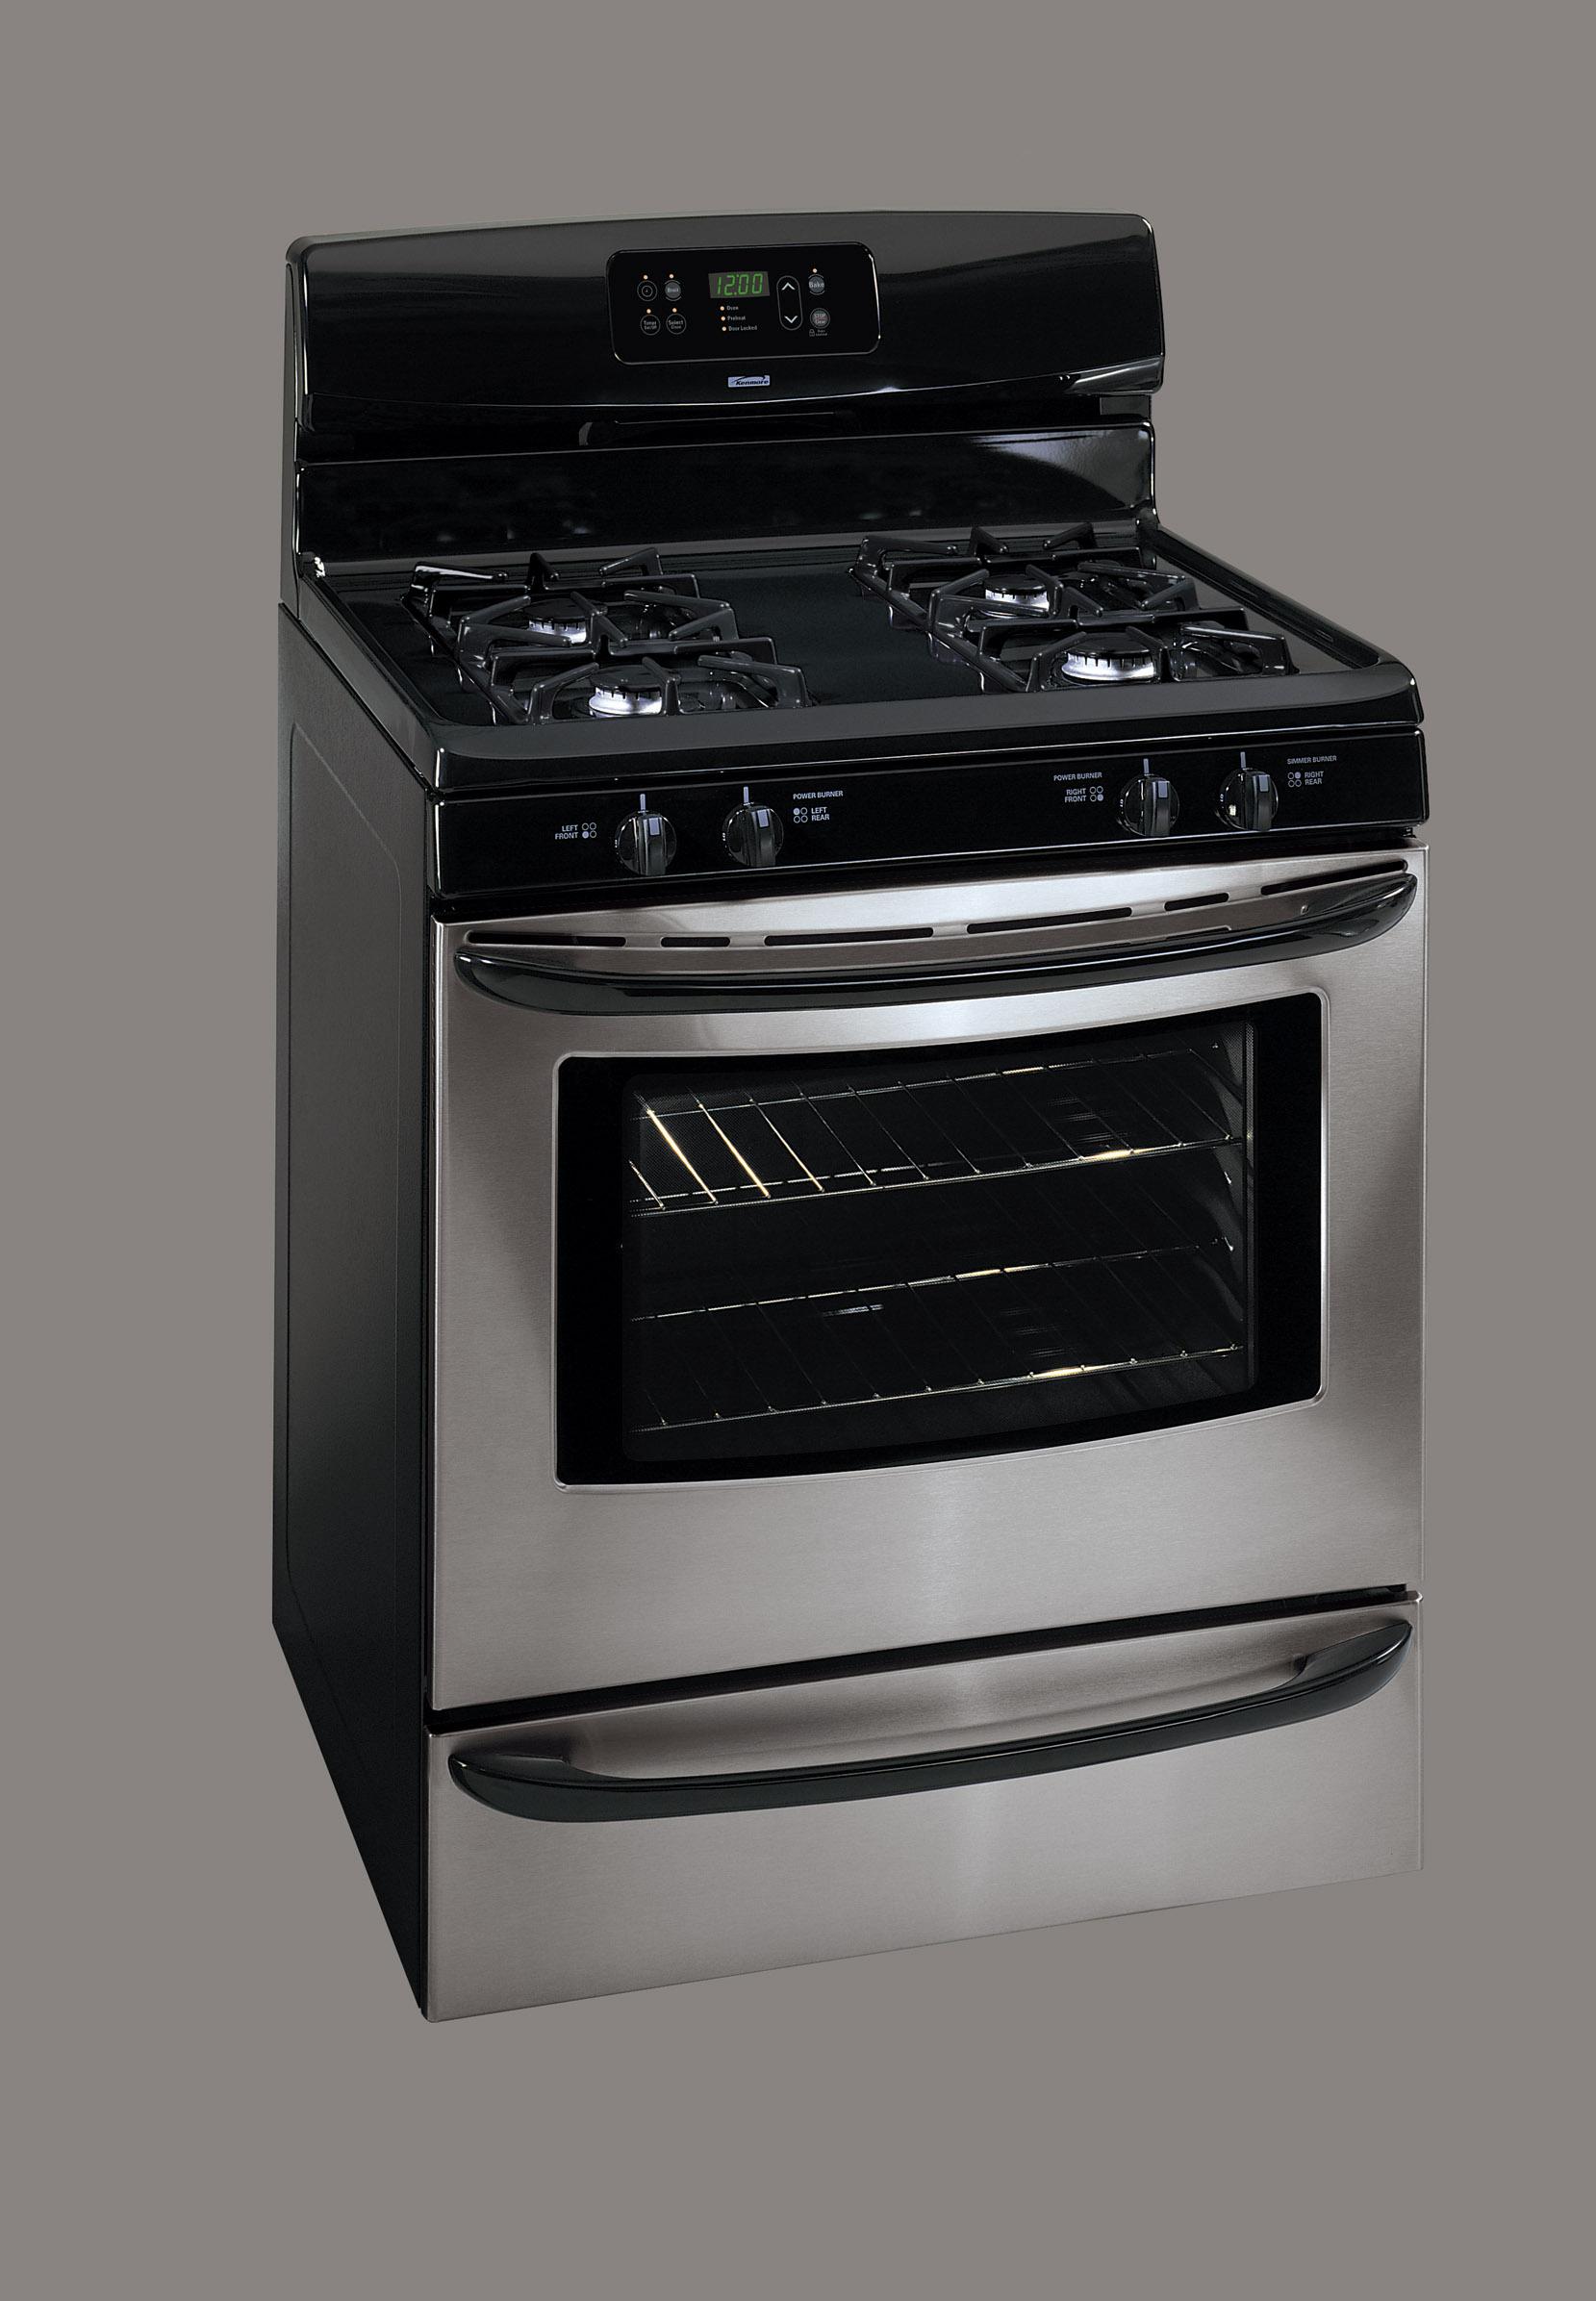 Kenmore Range/Stove/Oven Model 790.78573406 Parts